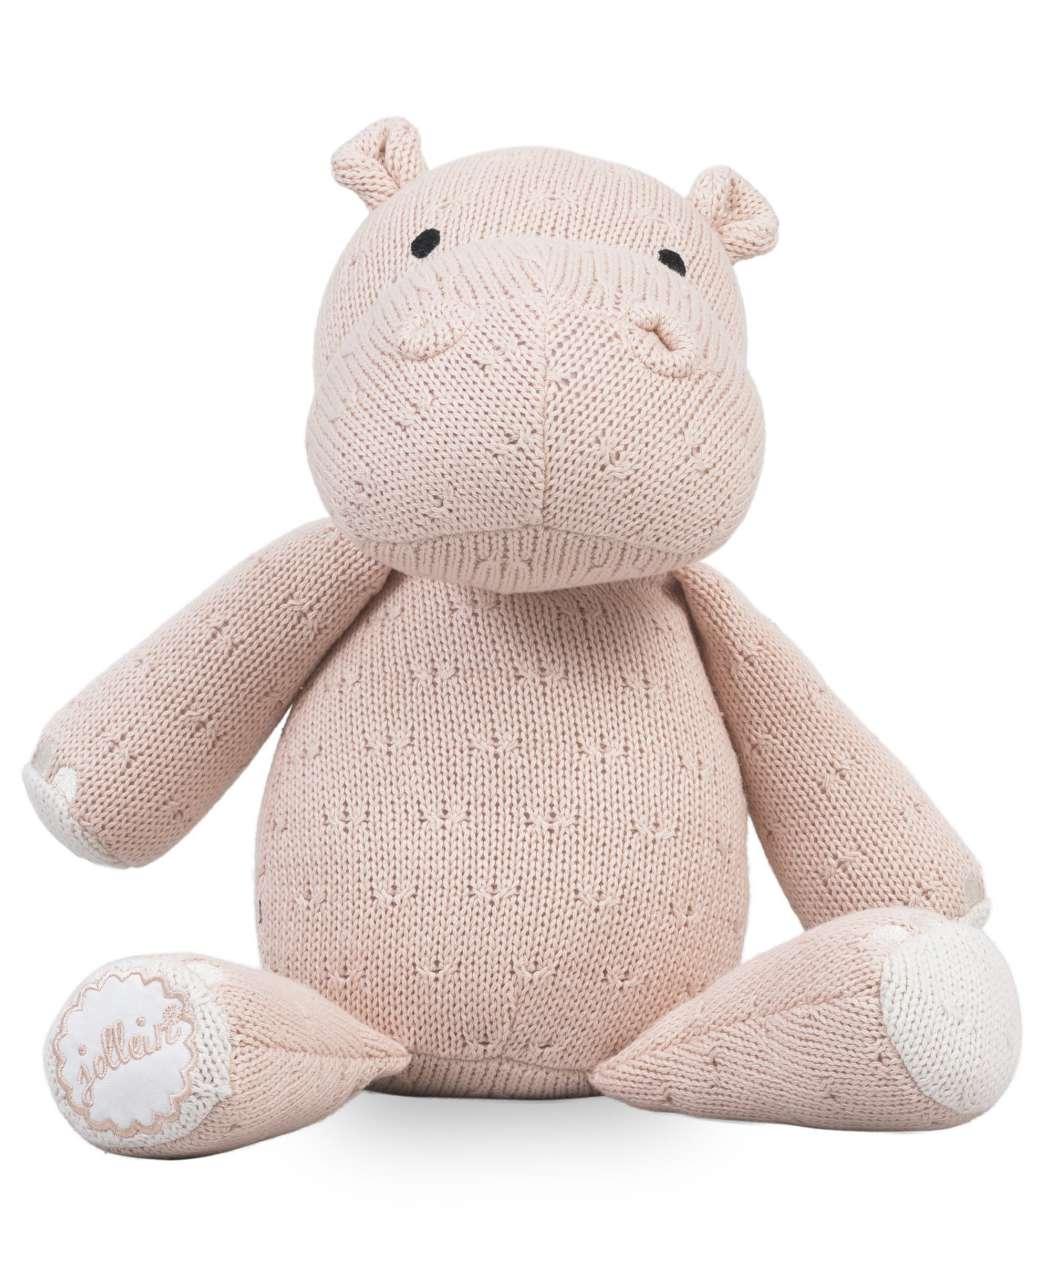 Knuffel_Soft_knit_hippo_creamy_peach